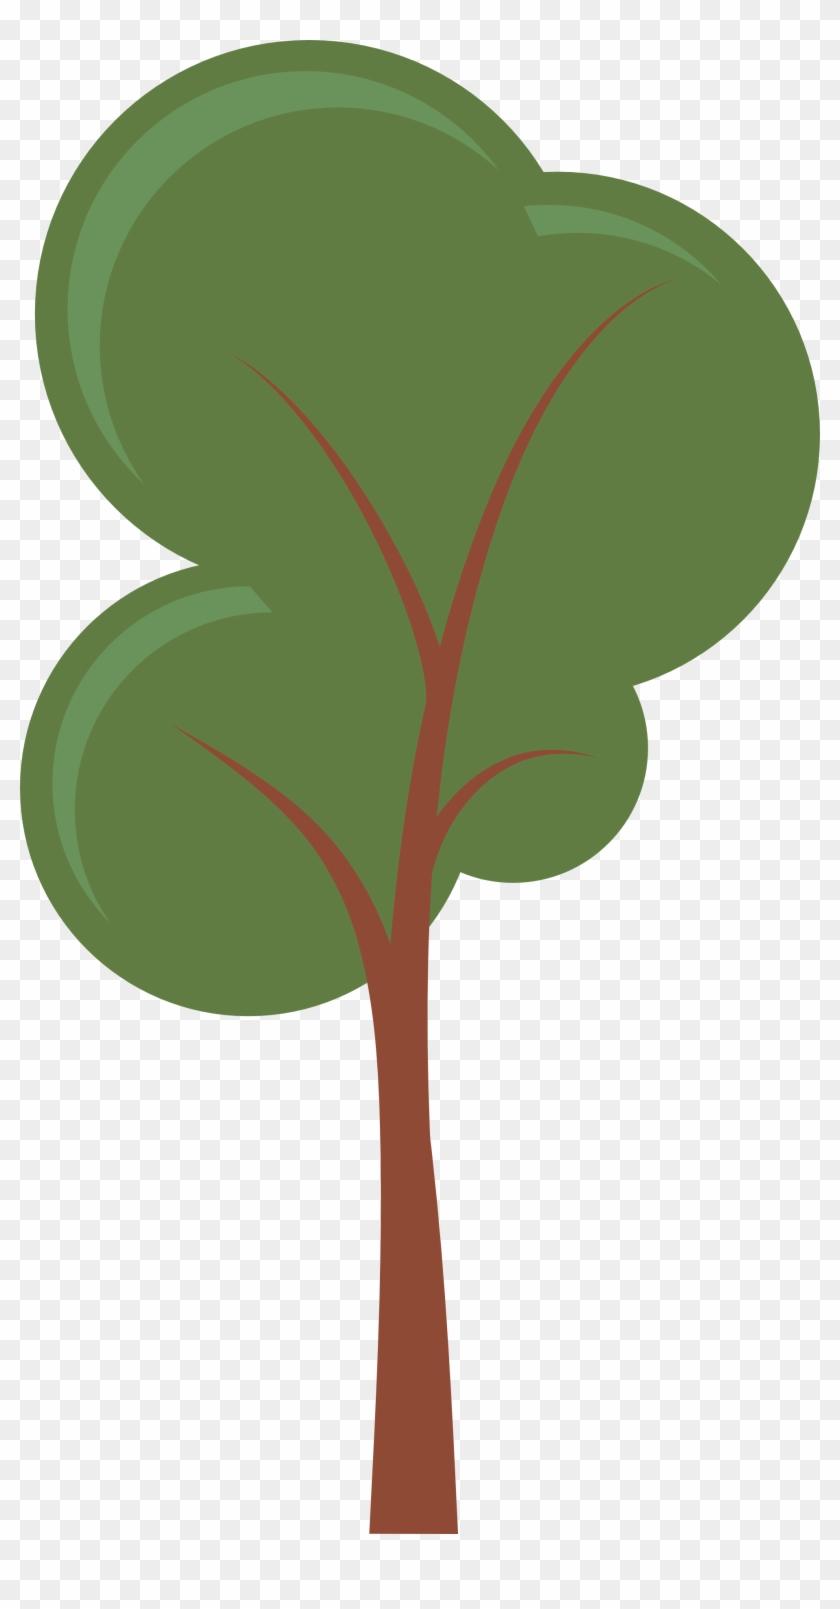 Tree Of Life Clipart At Getdrawings Cartoon Tree Vector Png